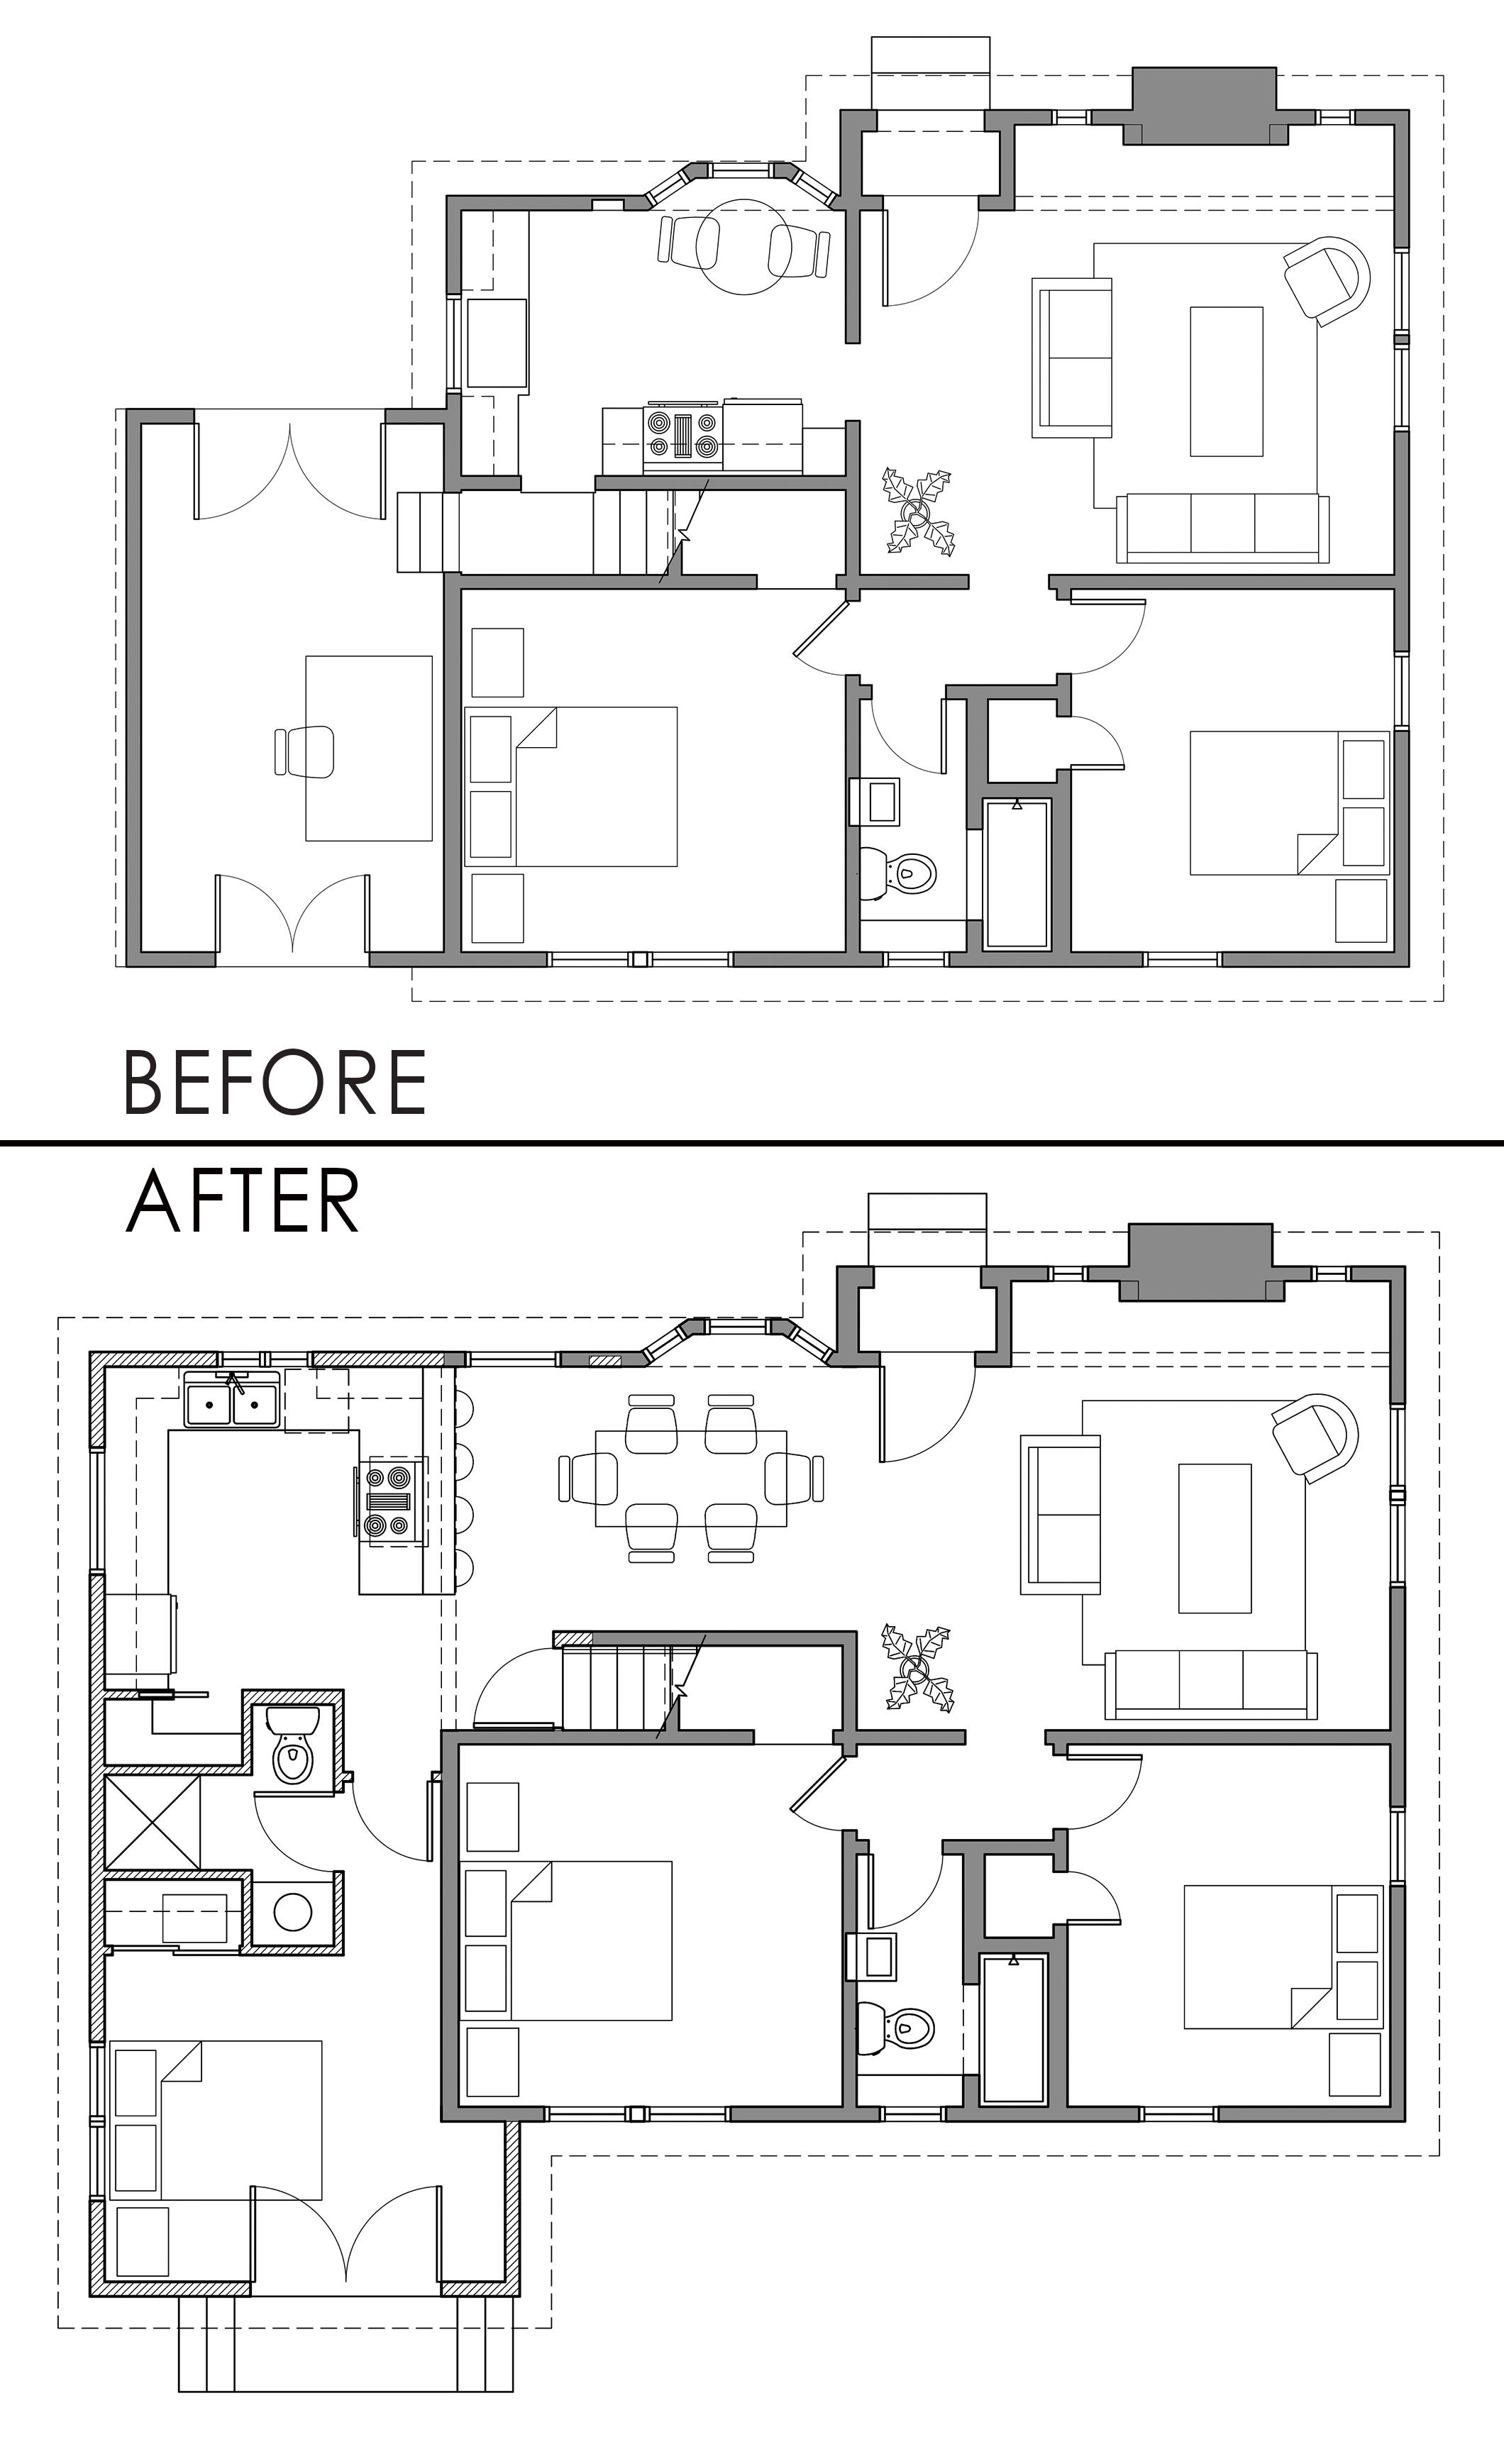 Harka Architecture_Rose City Park Home Remodel (27).jpg